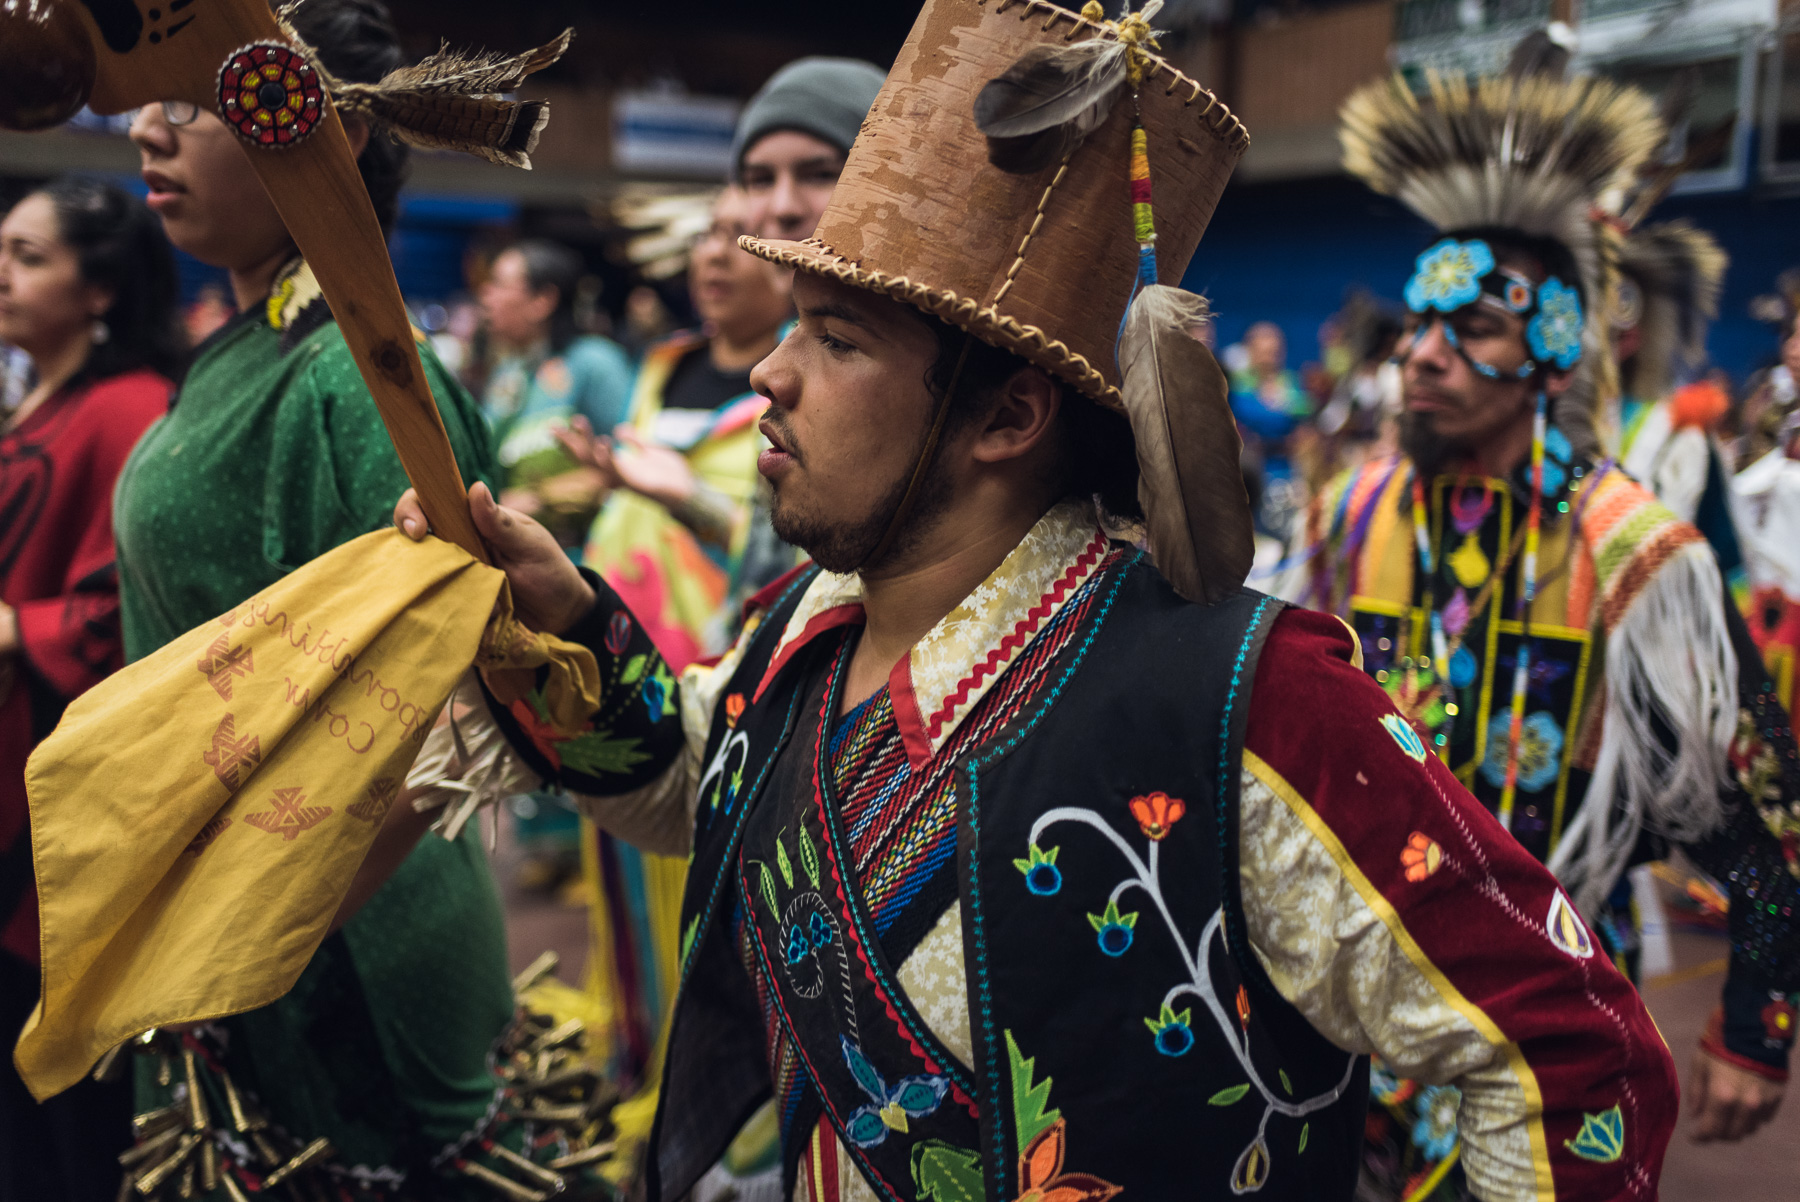 31st-Annual-LUNSA-Powwow-Blog-105.jpg